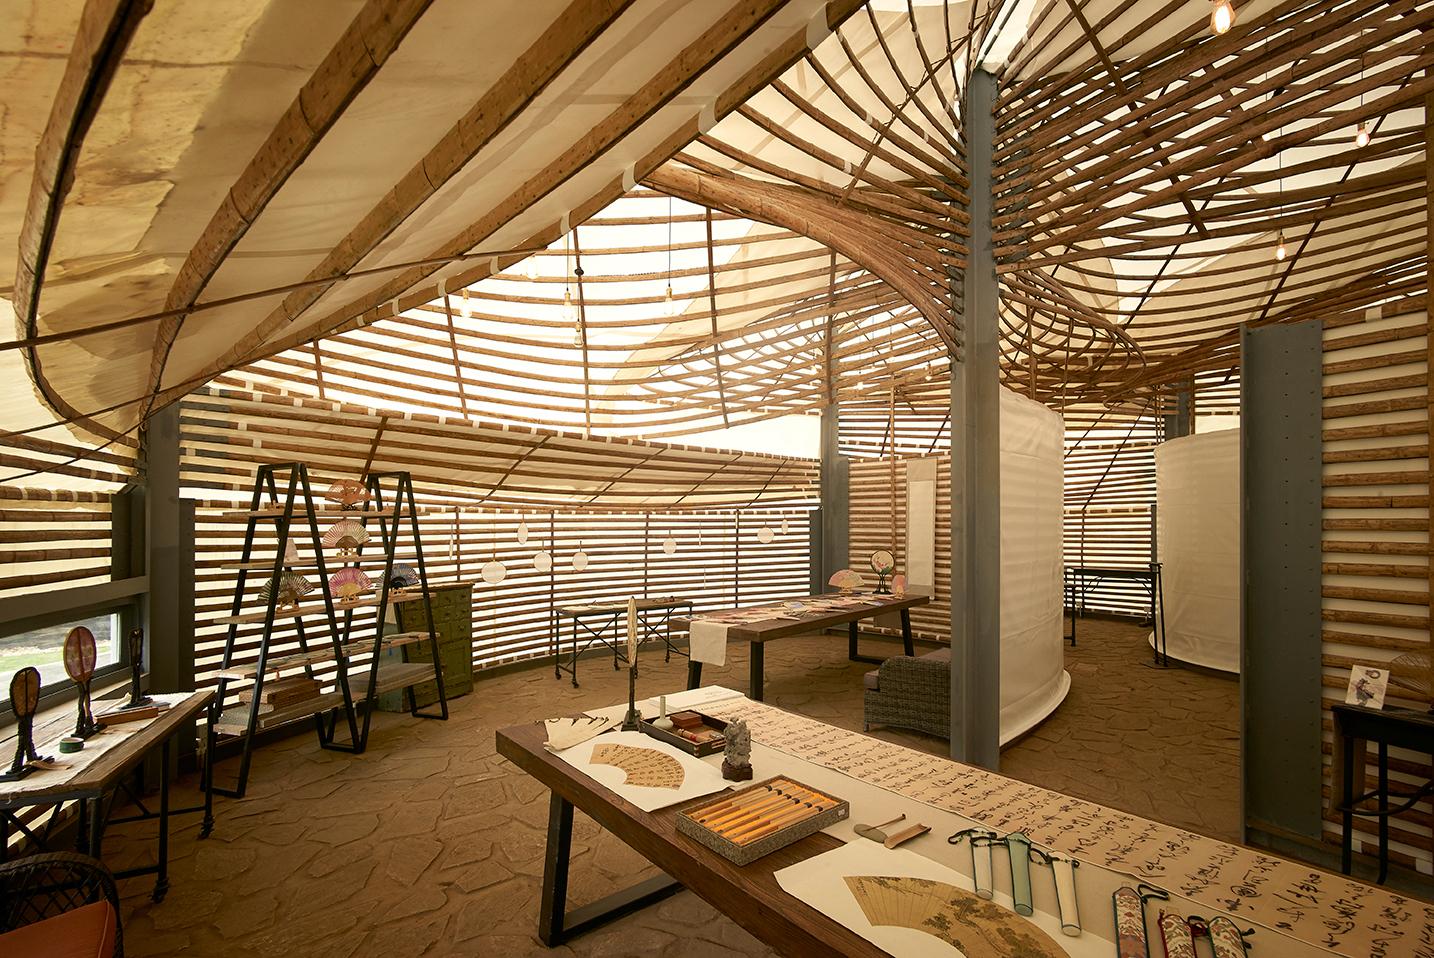 Galeria de primeira bienal internacional de arquitetura de bambu pelas lentes de julien lanoo 8 Bambu de interior